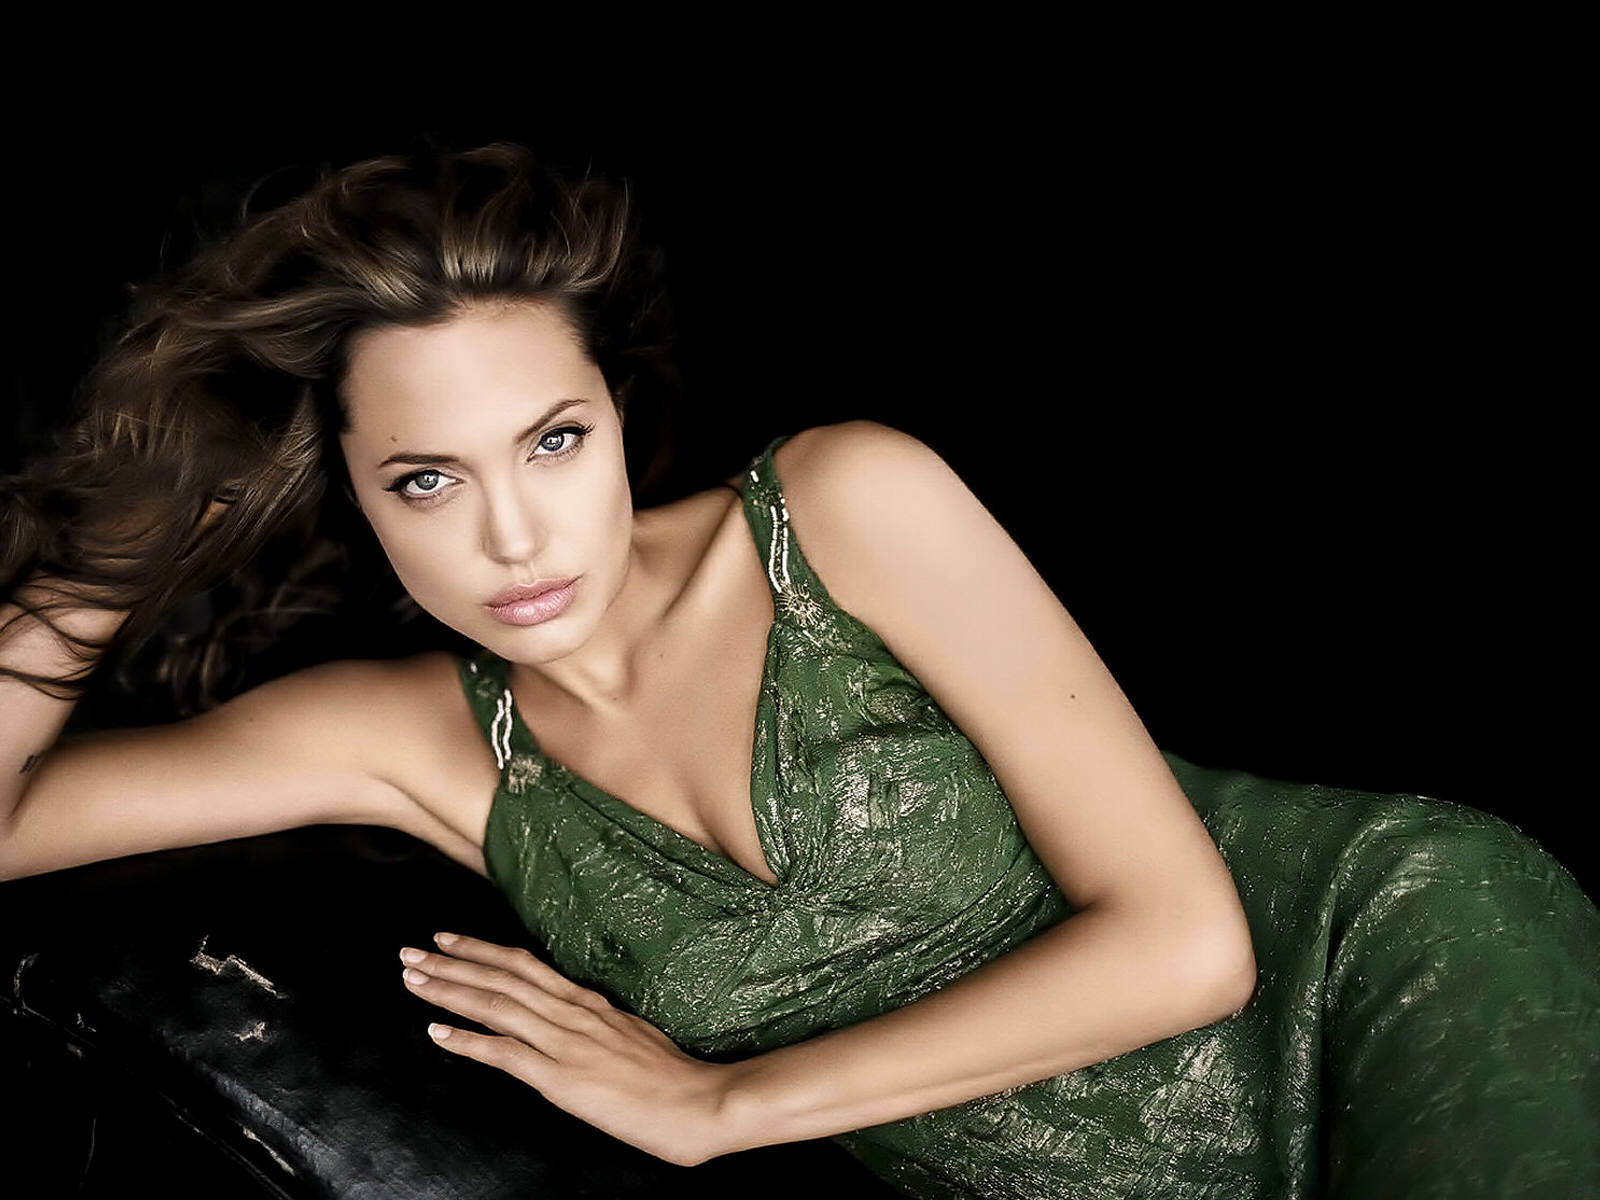 Angelina Jolie: Angelina Jolie Lovely Hd Hot Wallpapers 2013